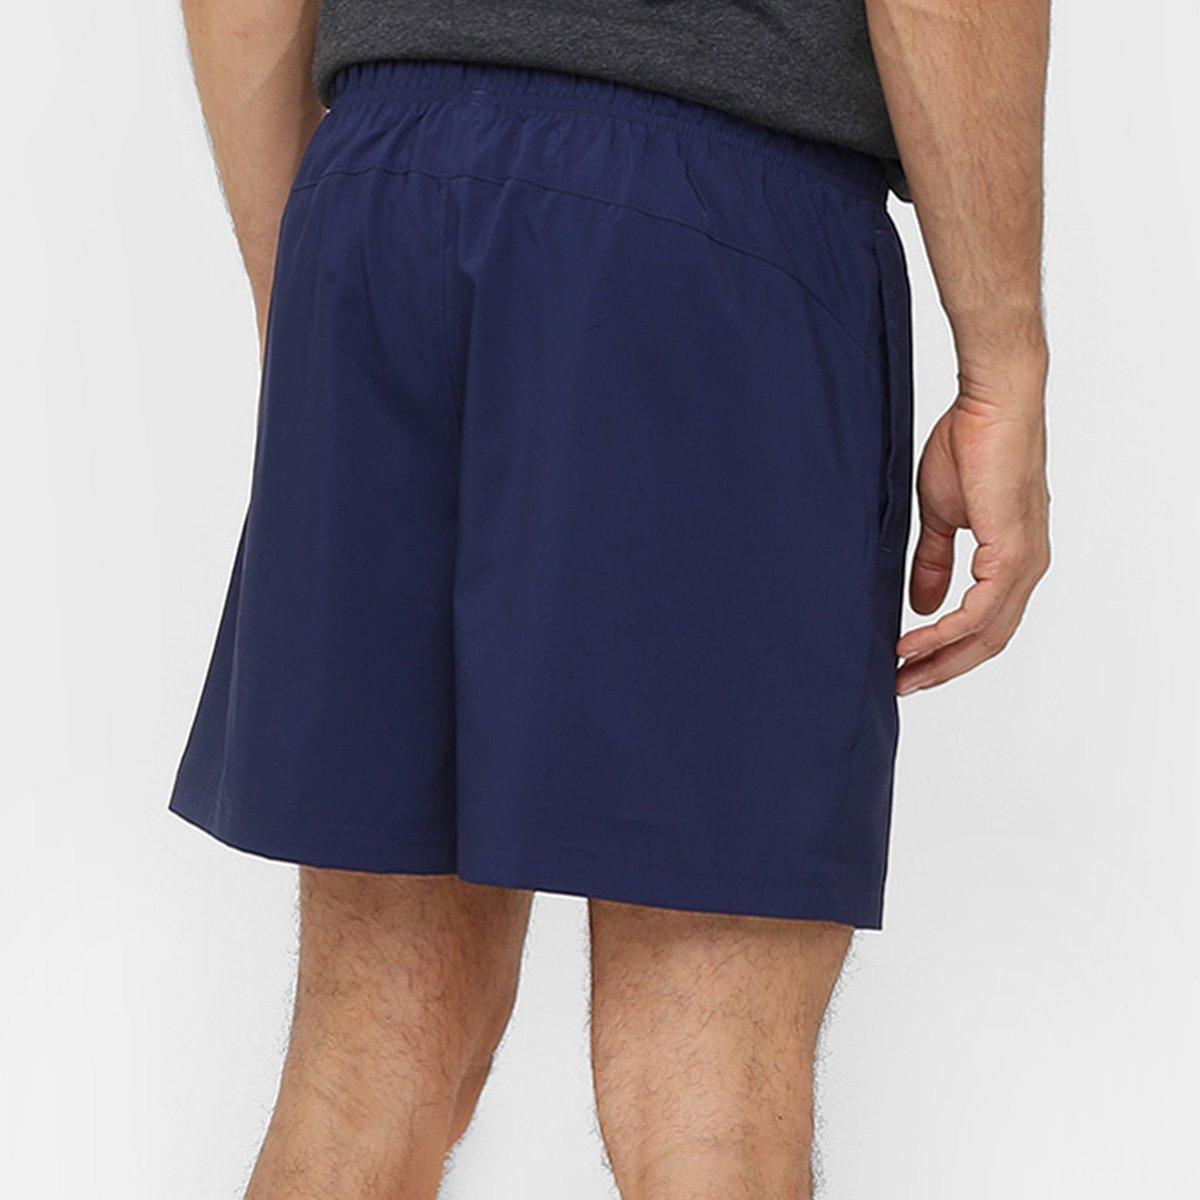 Short Puma Active Essential Woven 5 Masculino - Marinho - Compre ... 72aefd9ba3084